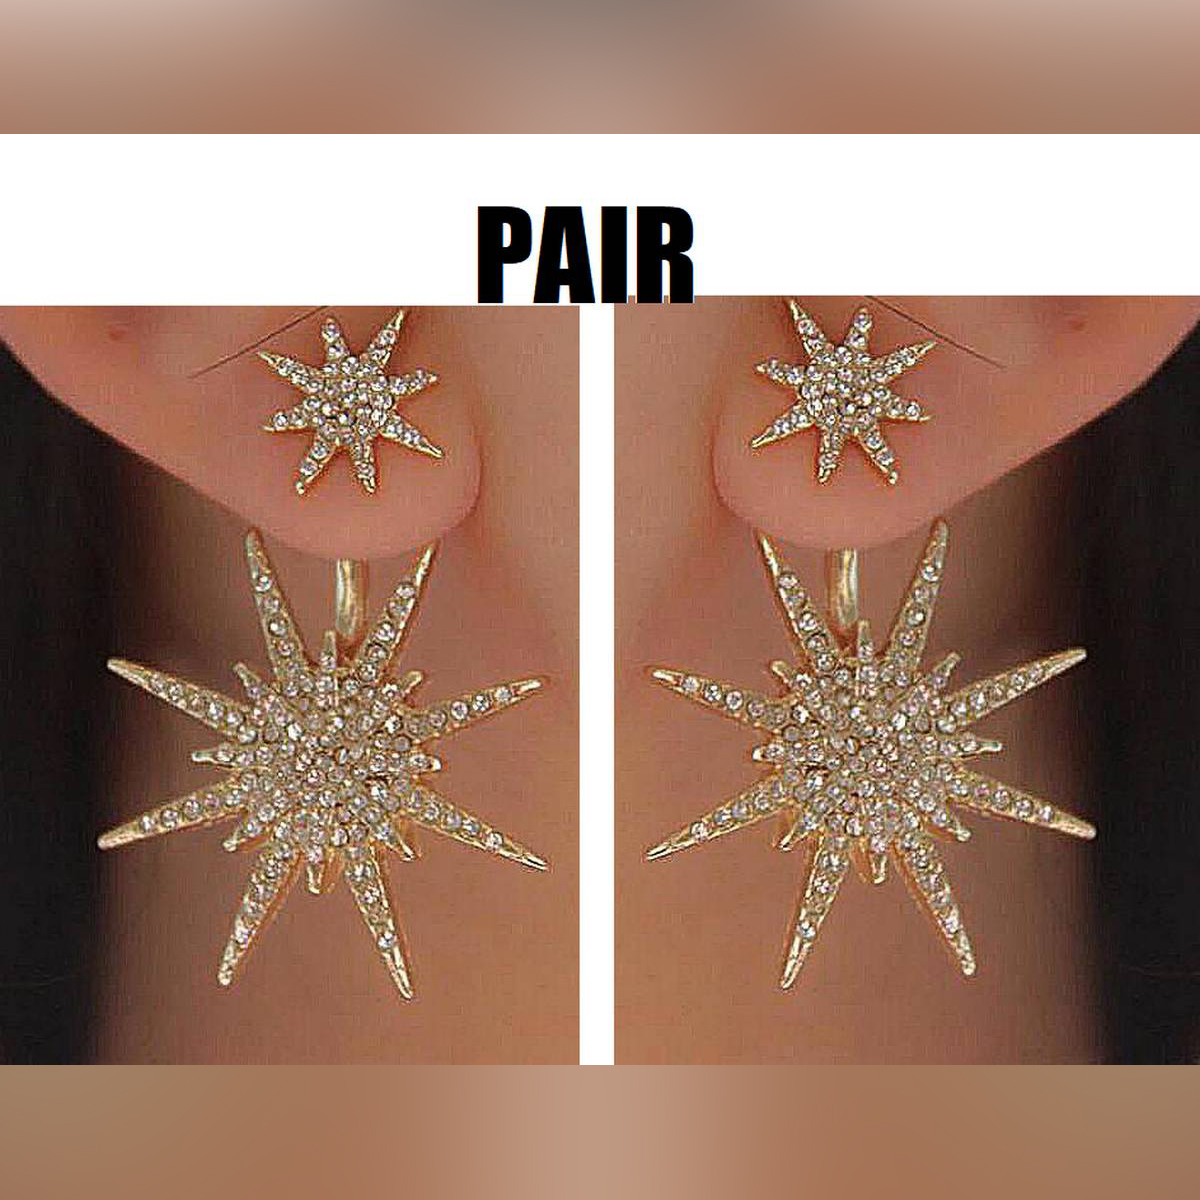 For Both Ears Hot Selling Crystal Pair High Class Trendy Earrings